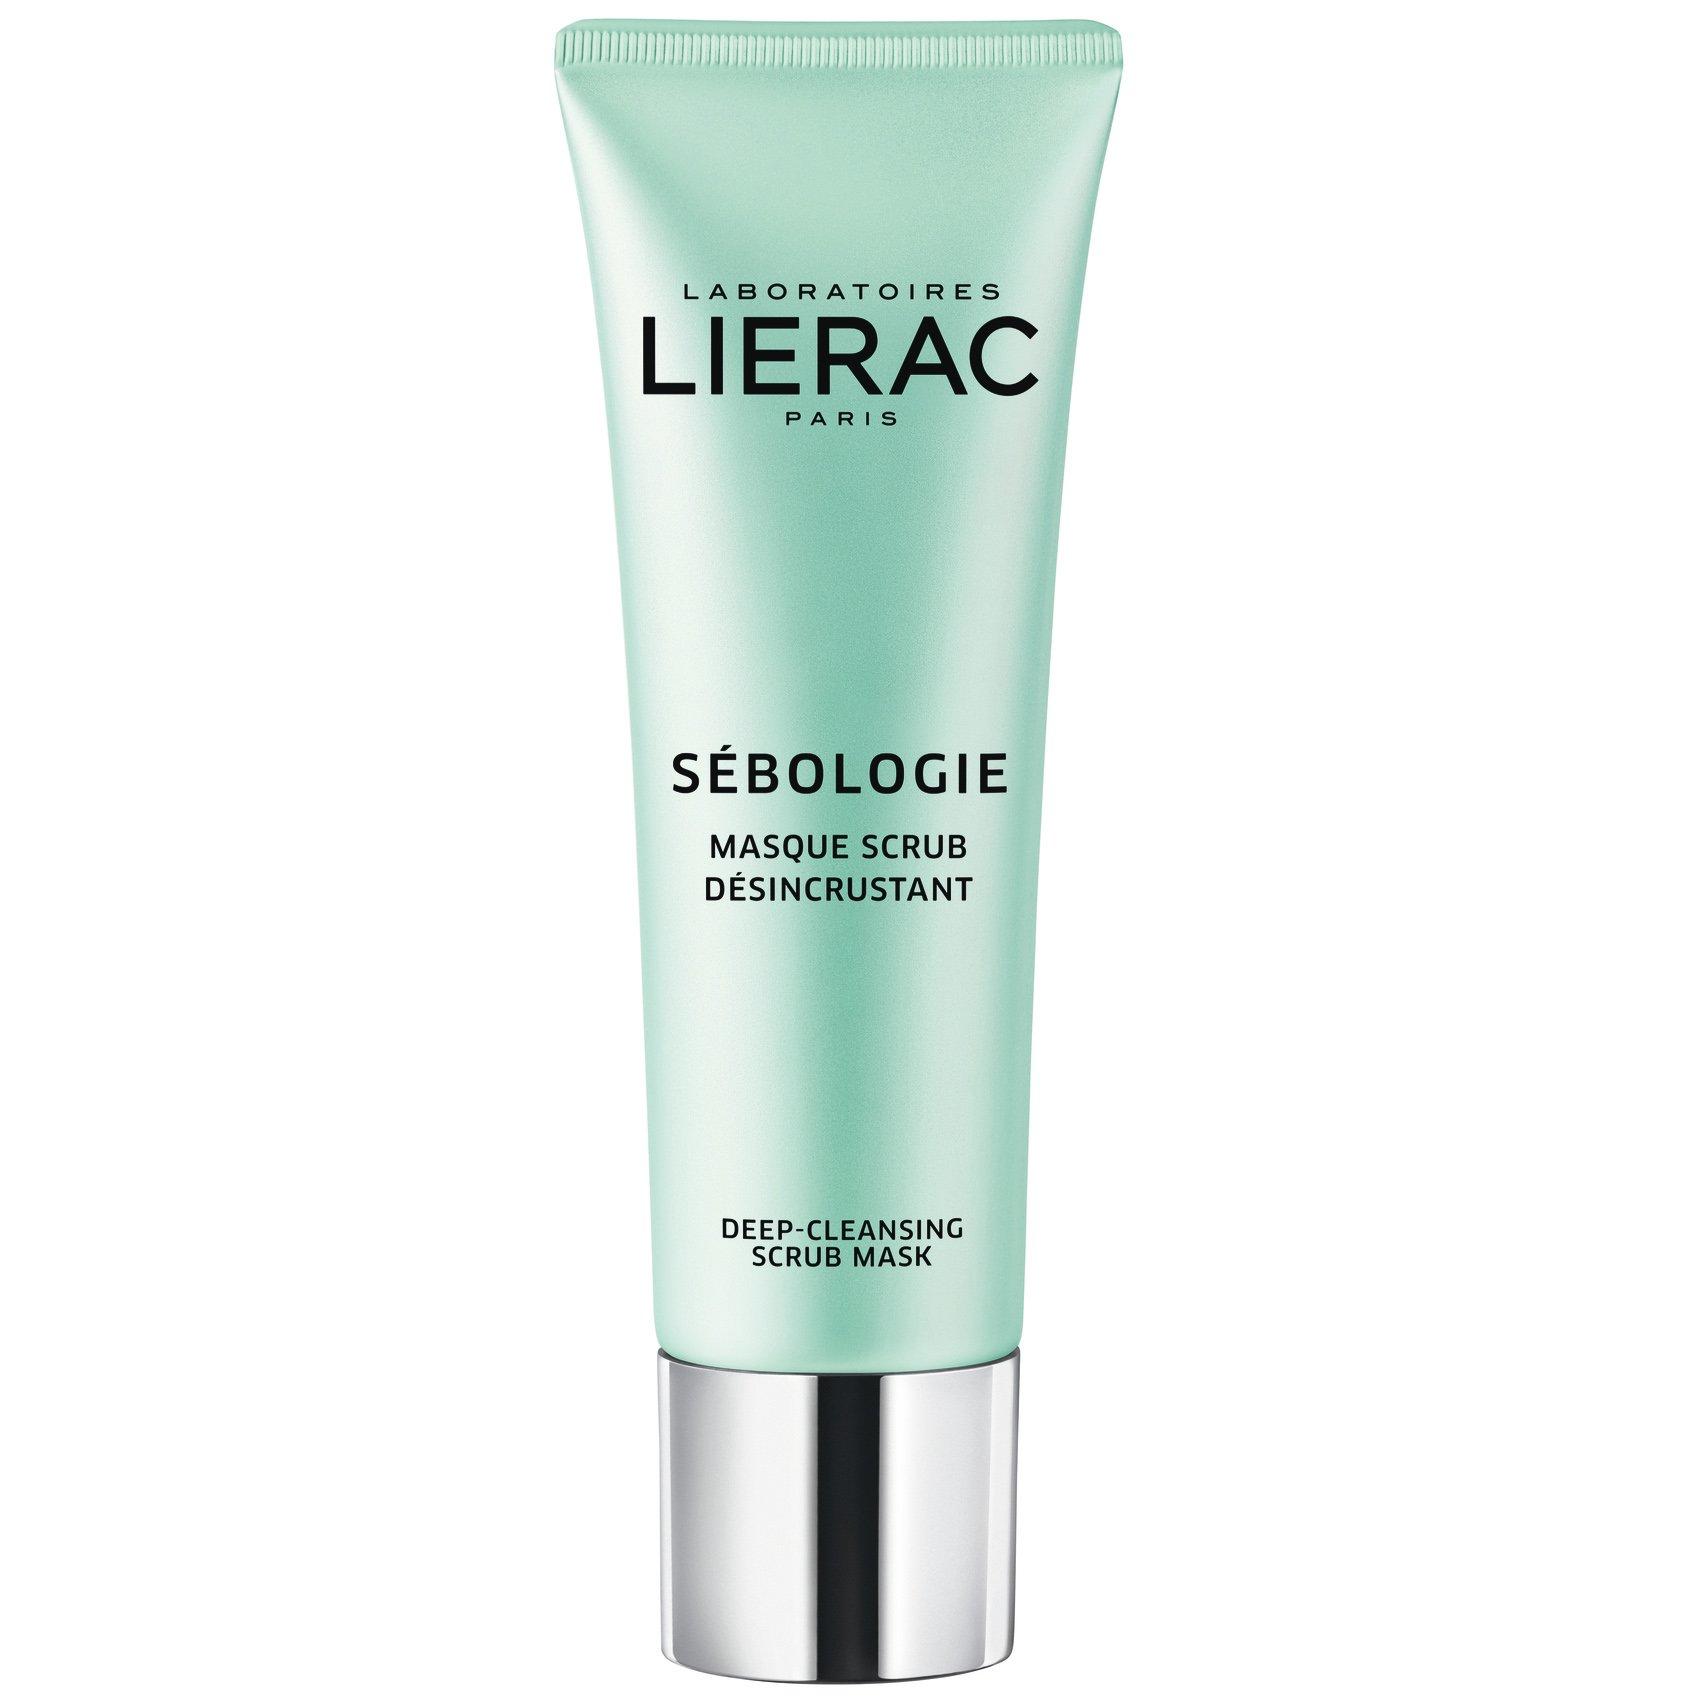 Lierac Sebologie Deep-Cleansing Scrub Mask Απολεπιστική Μάσκα Προσώπου για Καθαρισμό της Επιδερμίδας σε Βάθος 50ml